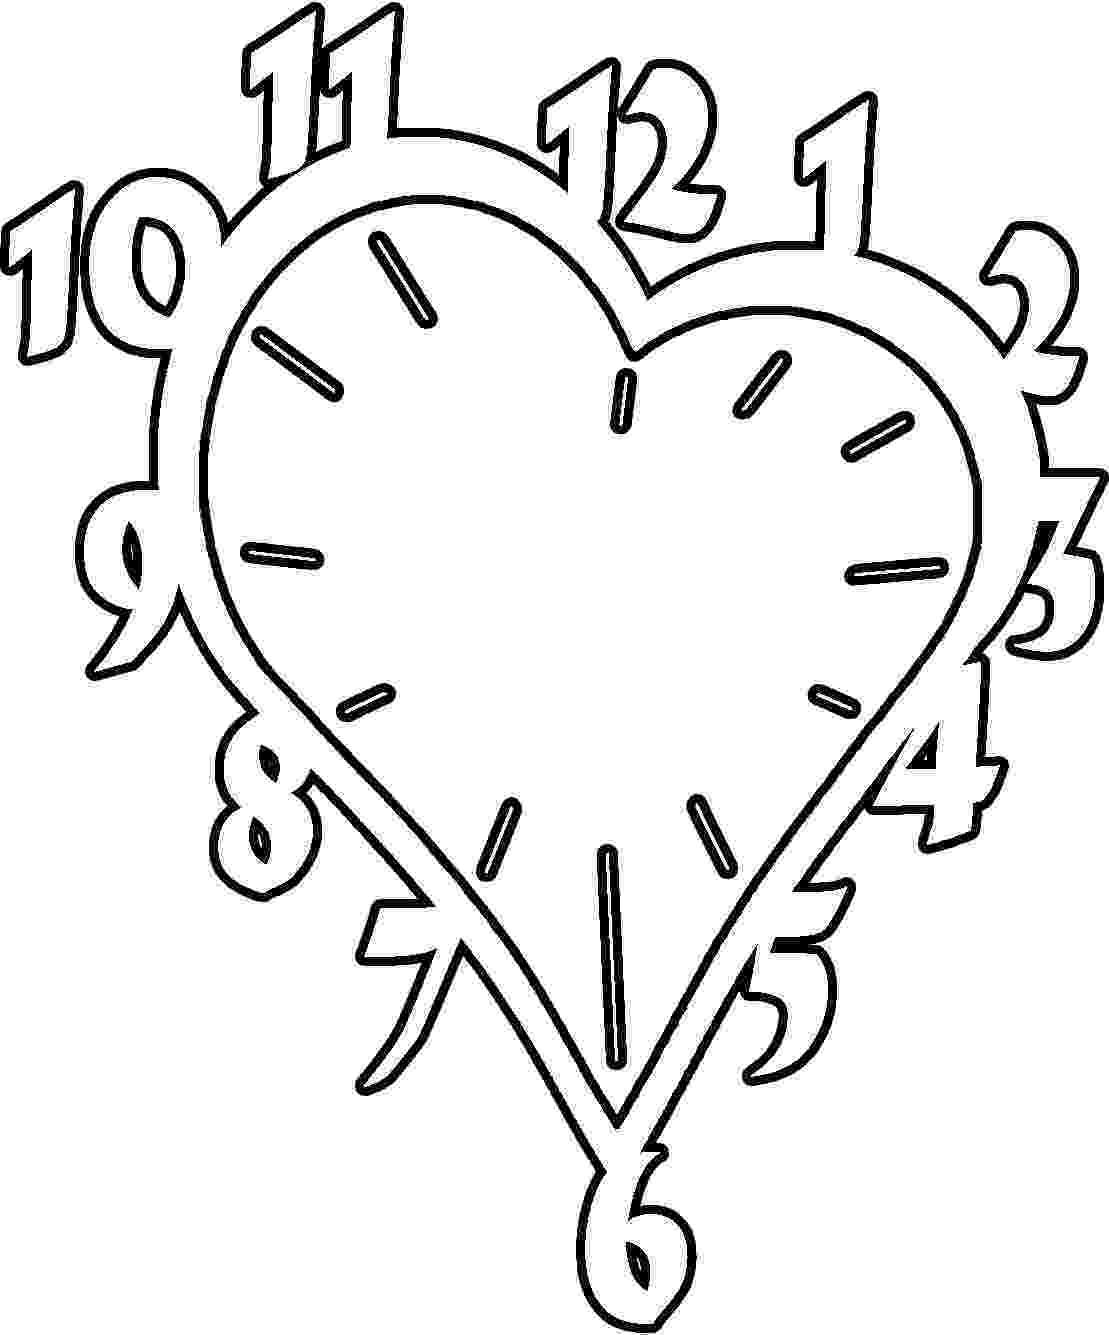 clock coloring page clock coloring pages coloring pages to download and print page coloring clock